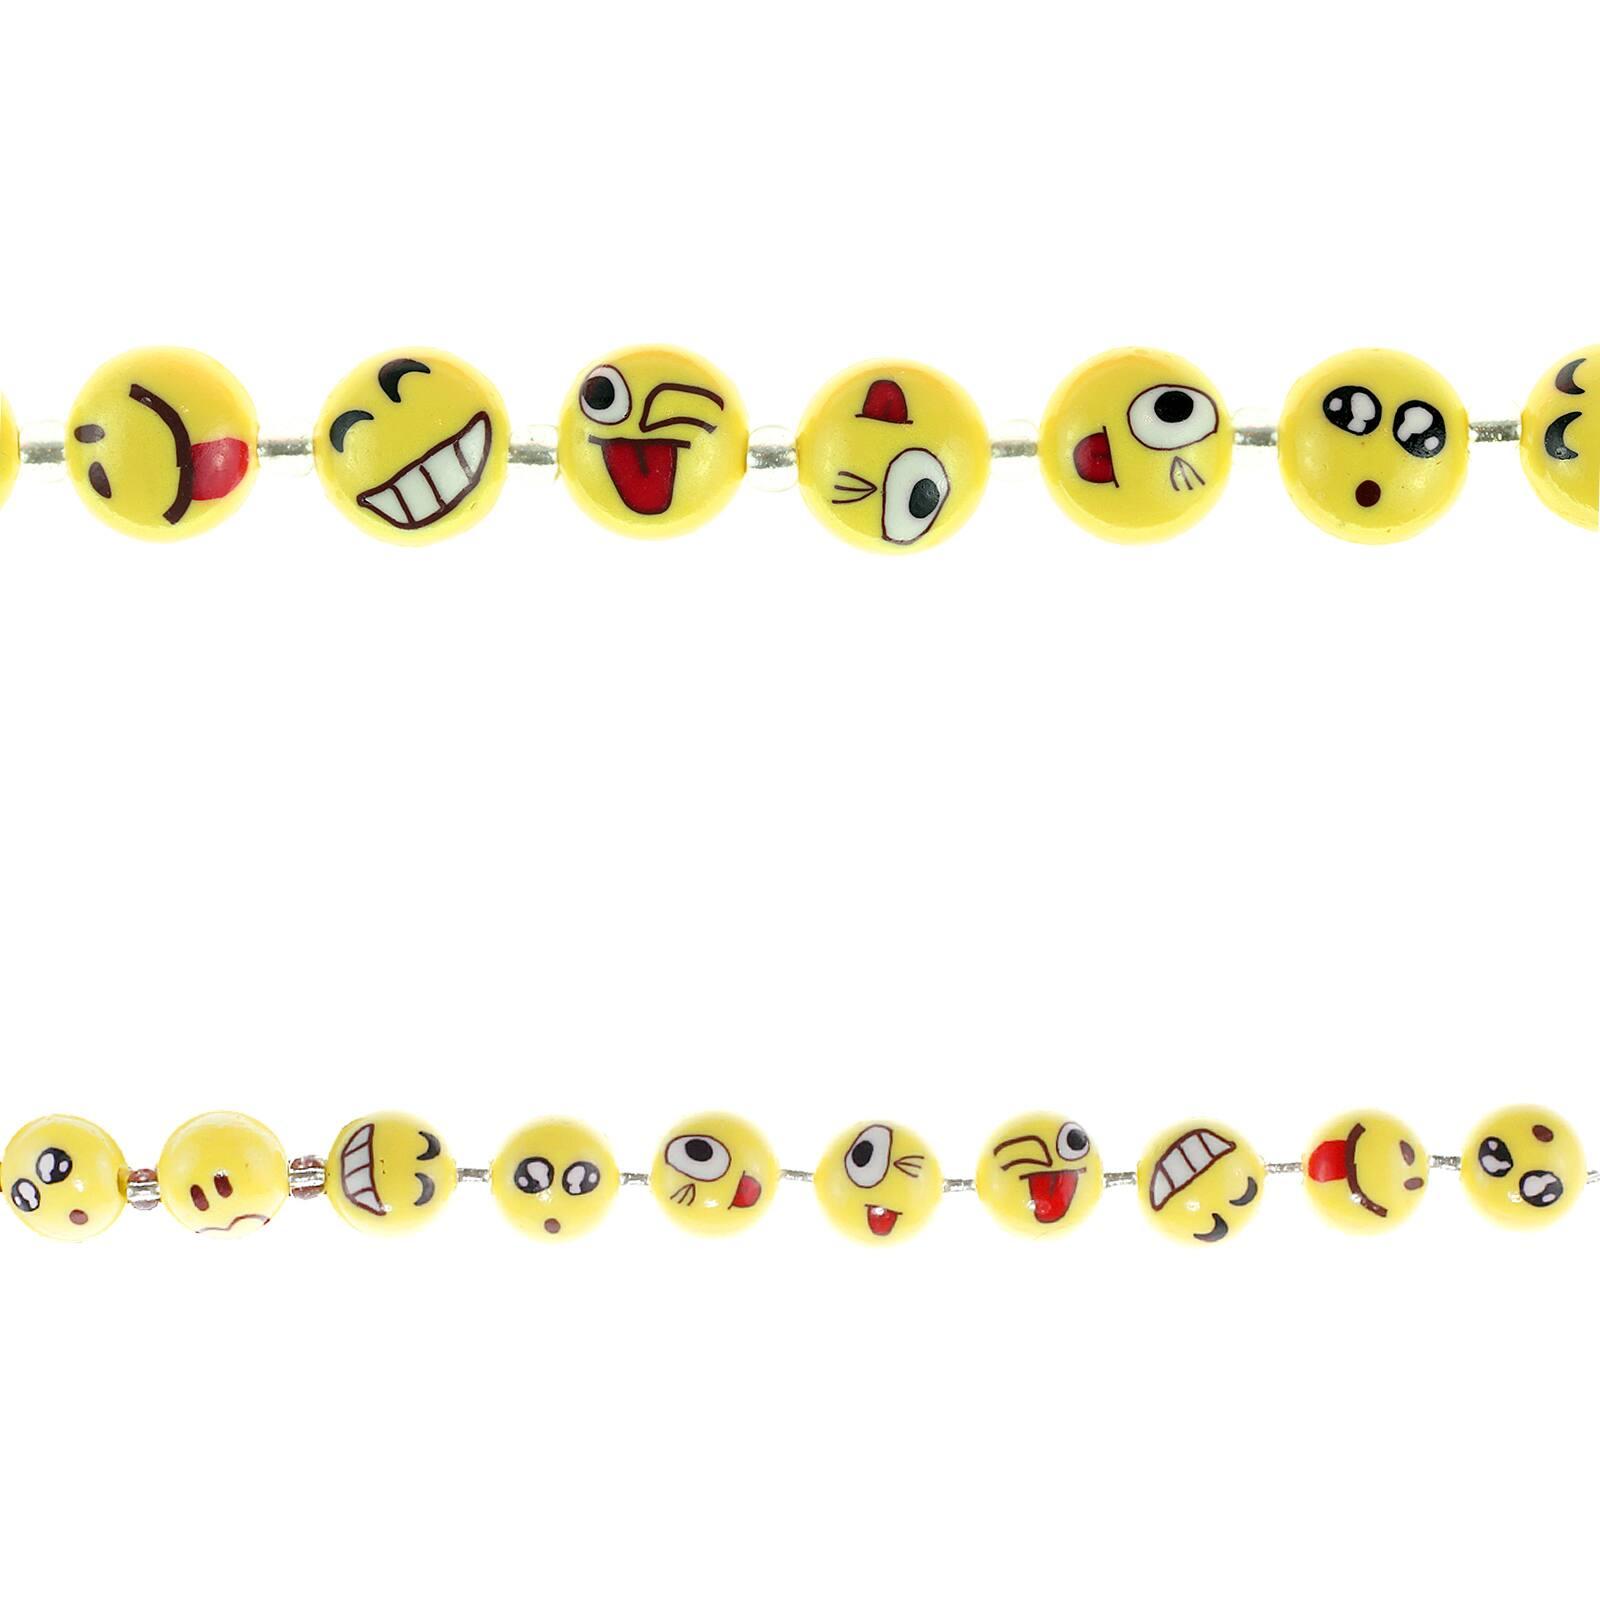 Custom Class of 2019 Graduation Smiling Emoji Leather Bracelet Choose Initial